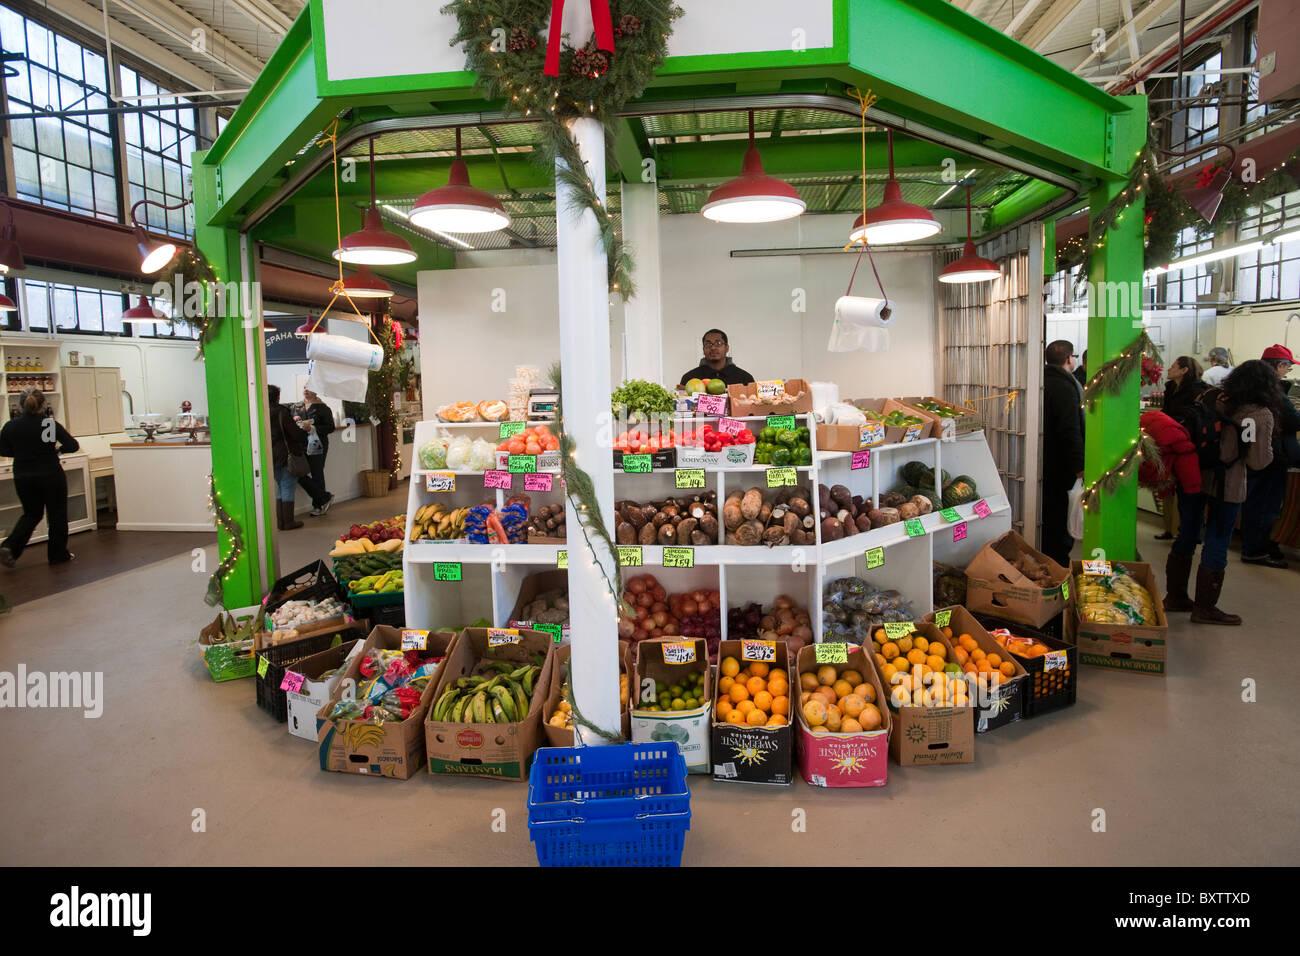 Produce stand in La Marqueta in the Spanish Harlem neighborhood of New York Stock Photo